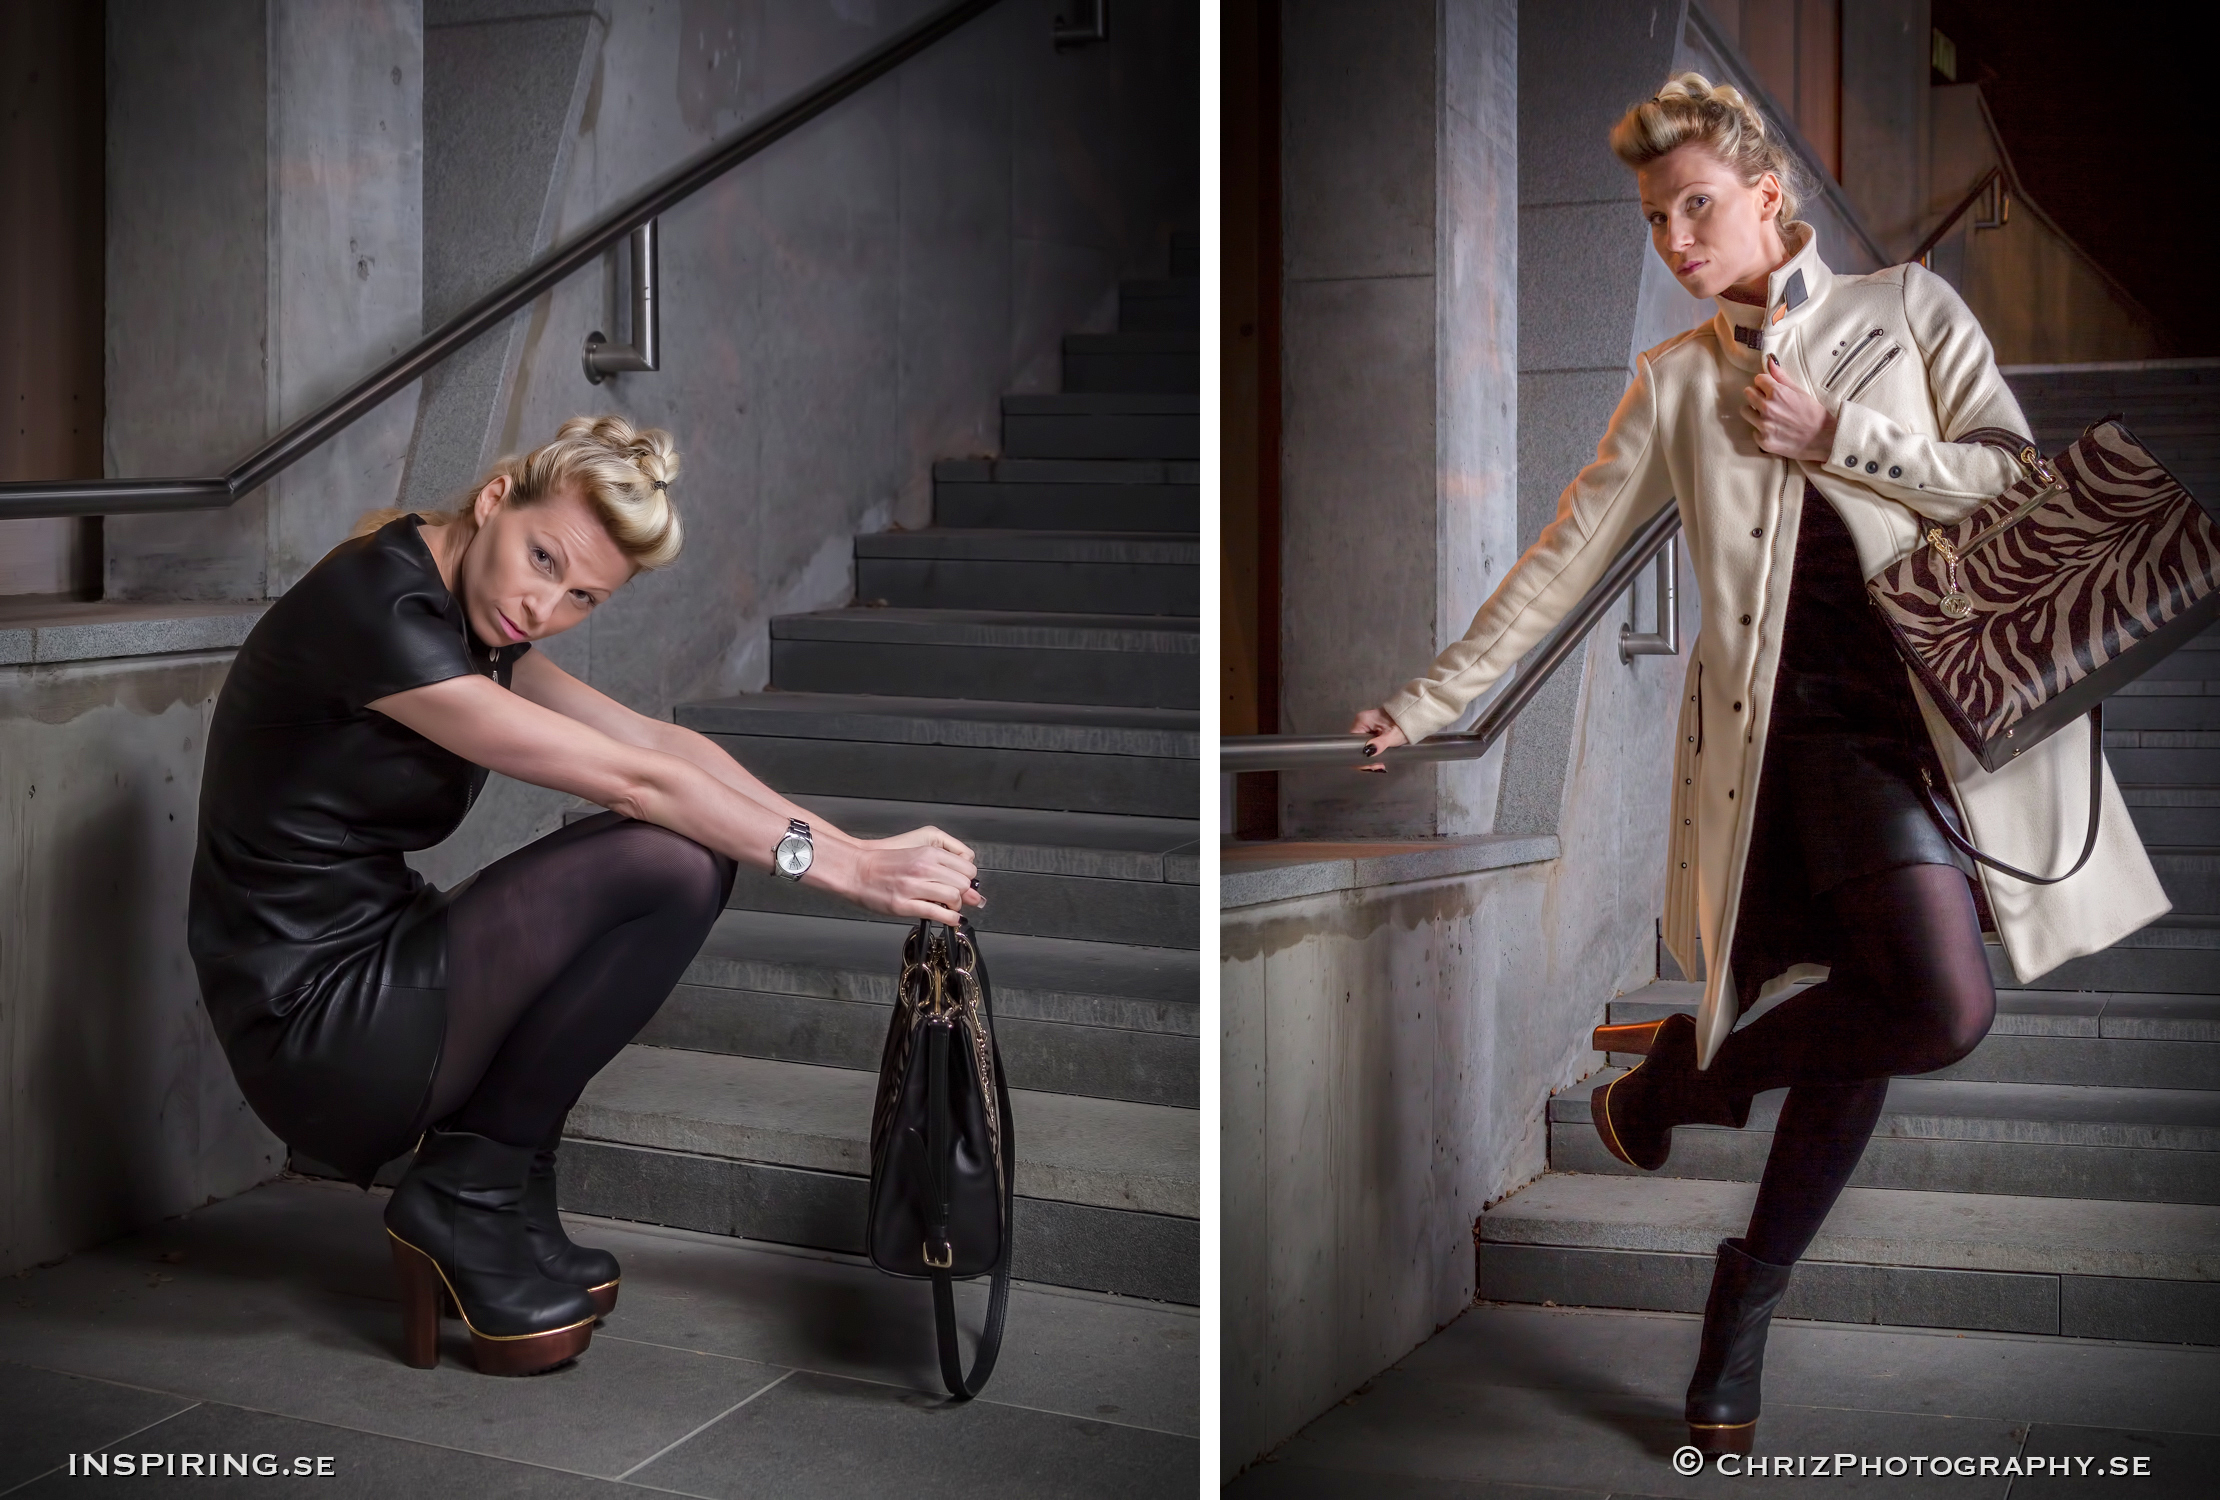 Inspiring.se_MyStyle_copyright_ChrizPhotography.se_fashion3_3_4.jpg